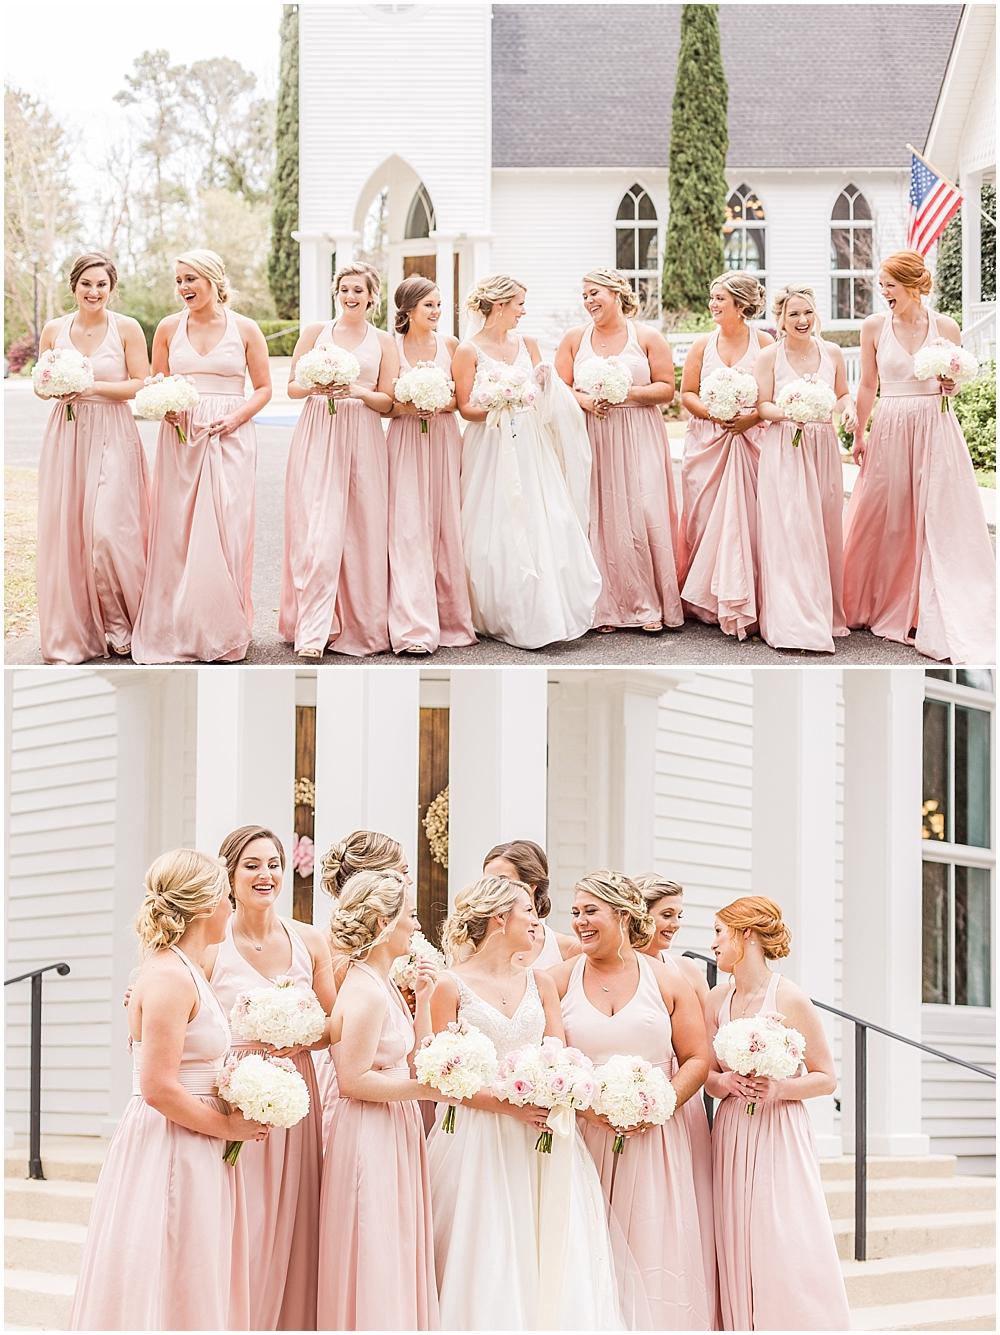 Ashton-Clark-Photography-Wedding-Portrait-Family-Photographer-Mobile-Alabama_0321.jpg